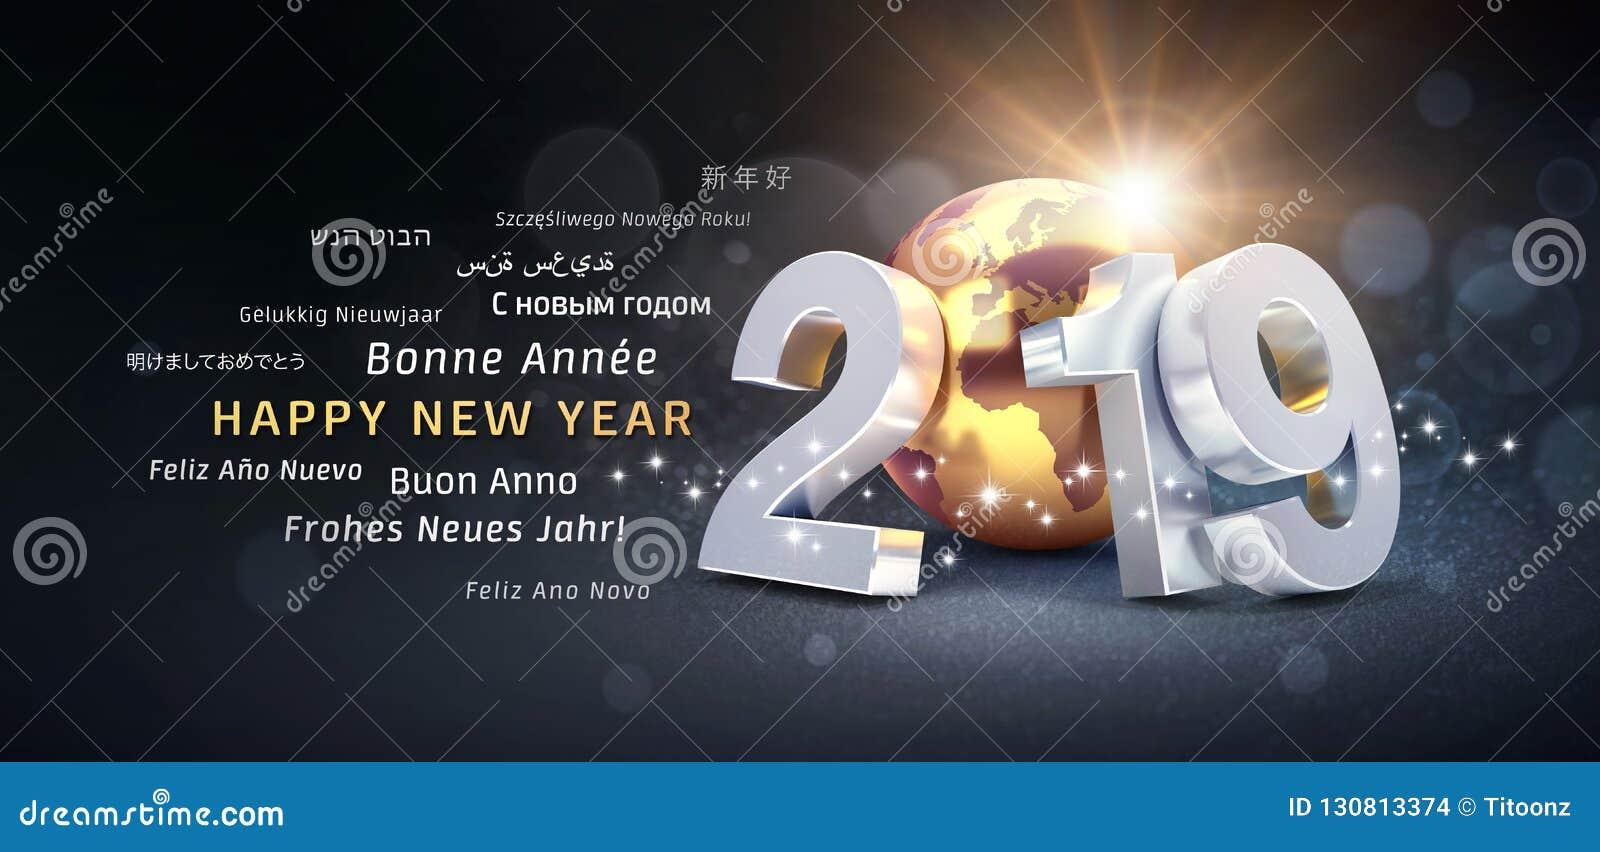 happy new year 2019 international greeting card